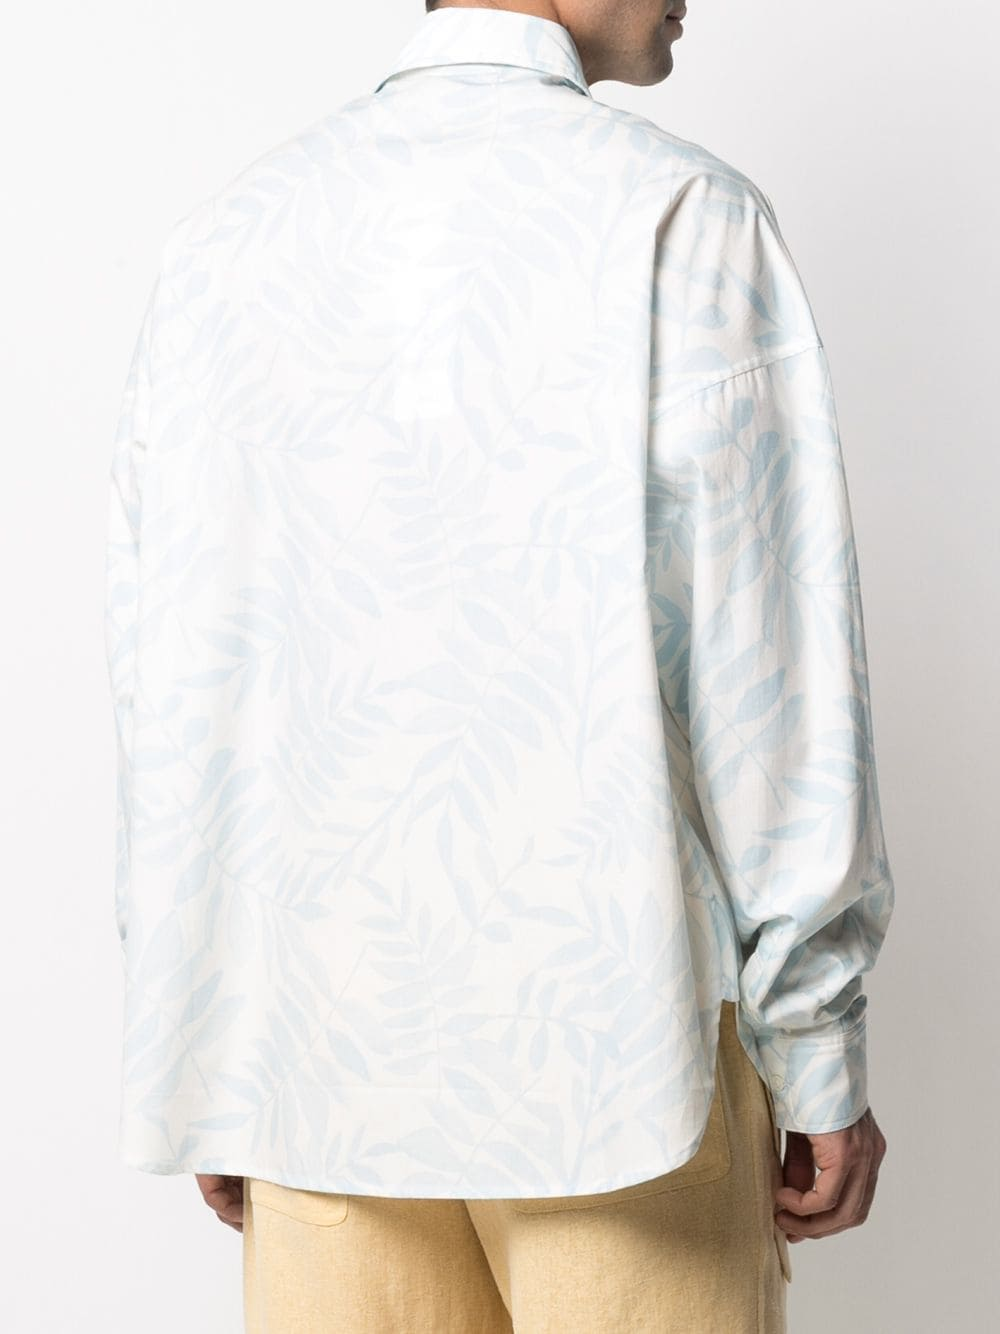 White and light blue cotton leaf-print shirt  JACQUEMUS      215SH05-113143